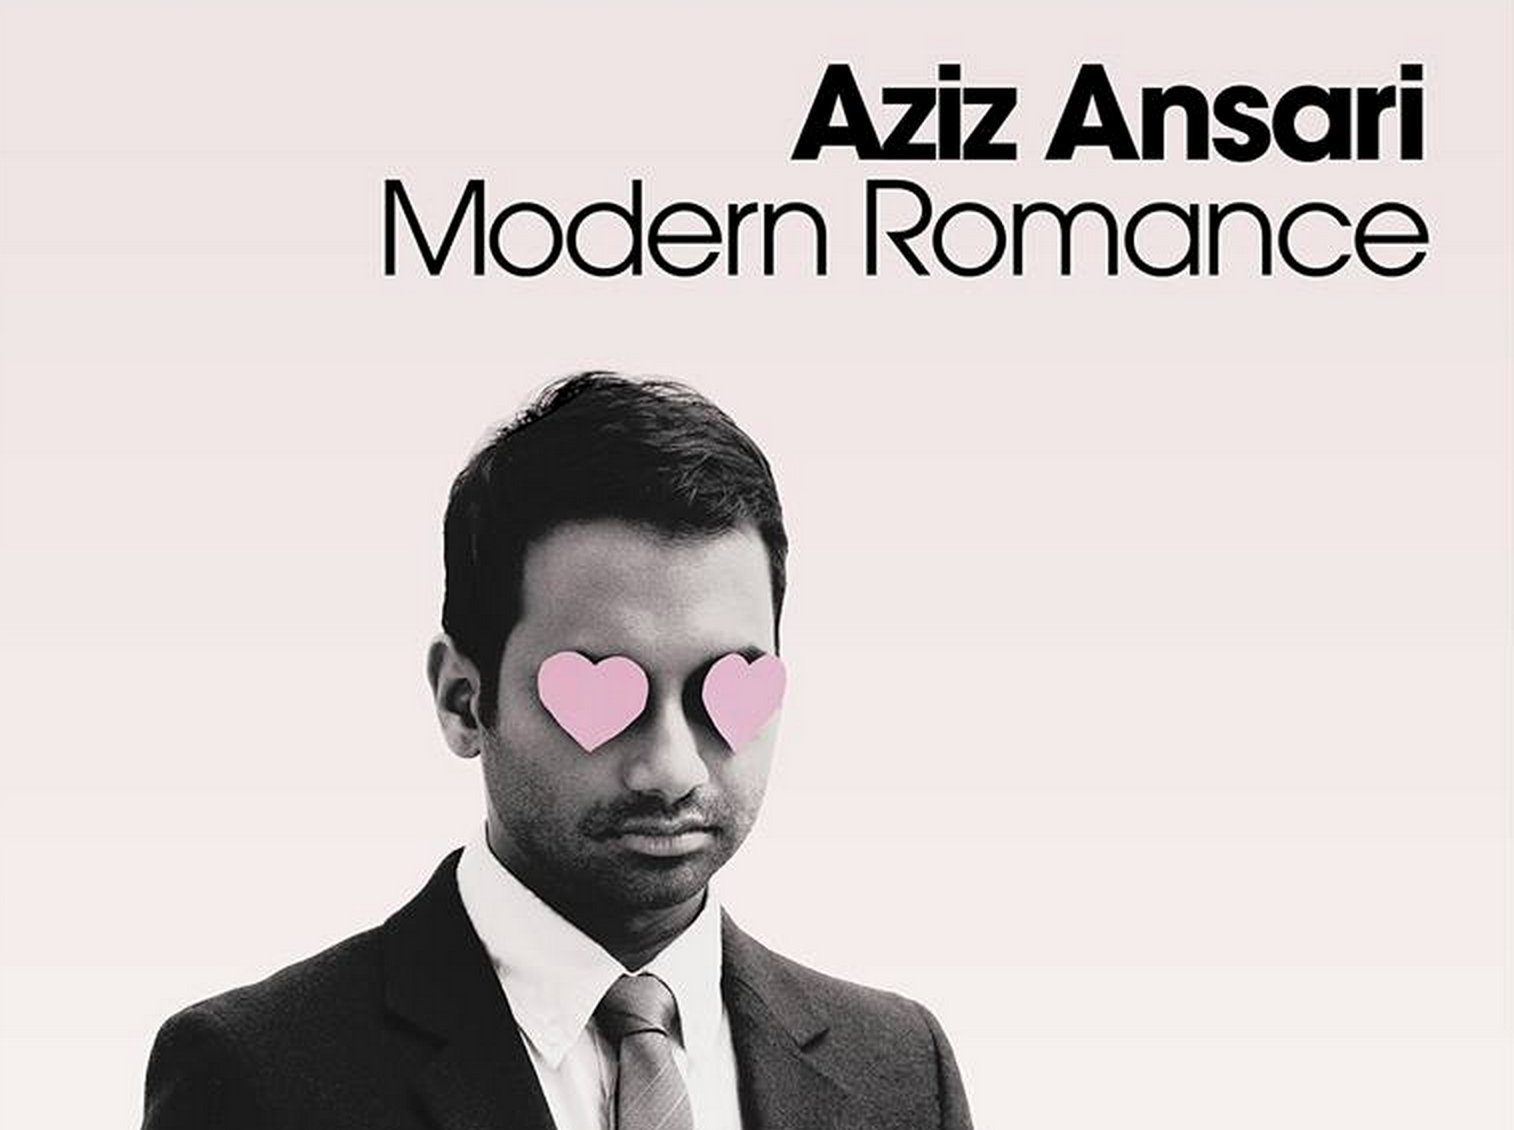 Aziz Ansari Love Online Dating Modern Romance and the